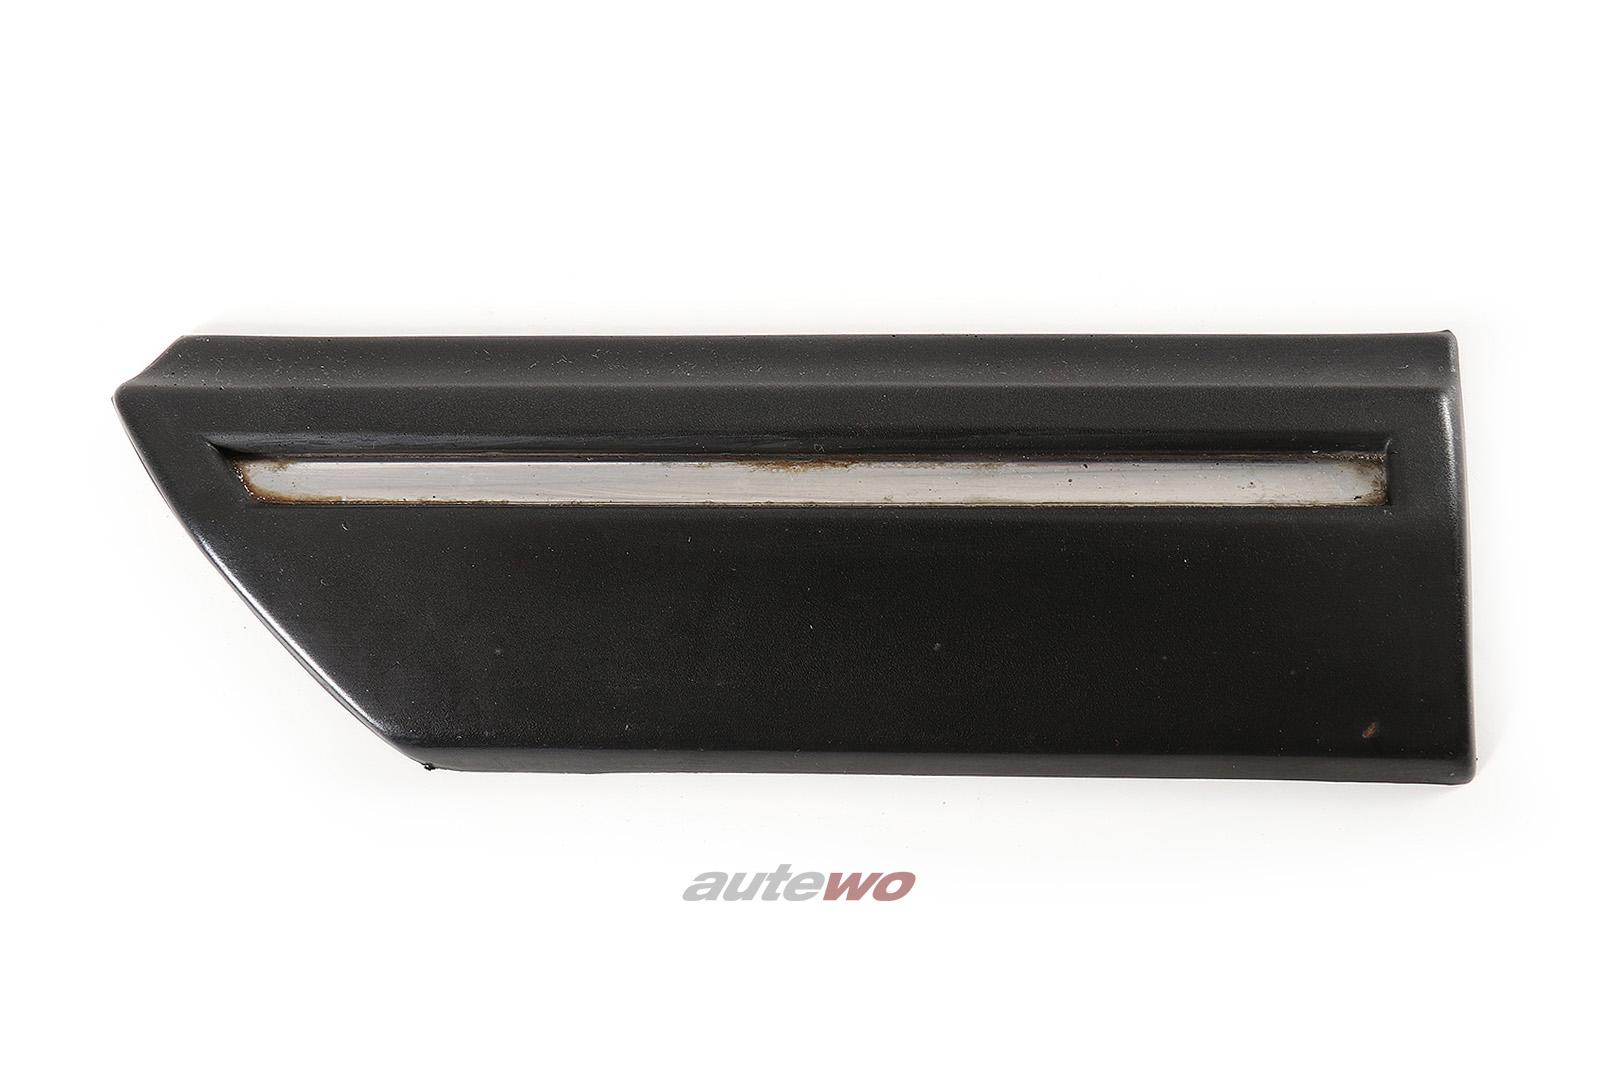 855853507A Audi Coupe Typ 81/85 Schutzleiste Kotflügel Vorne Links